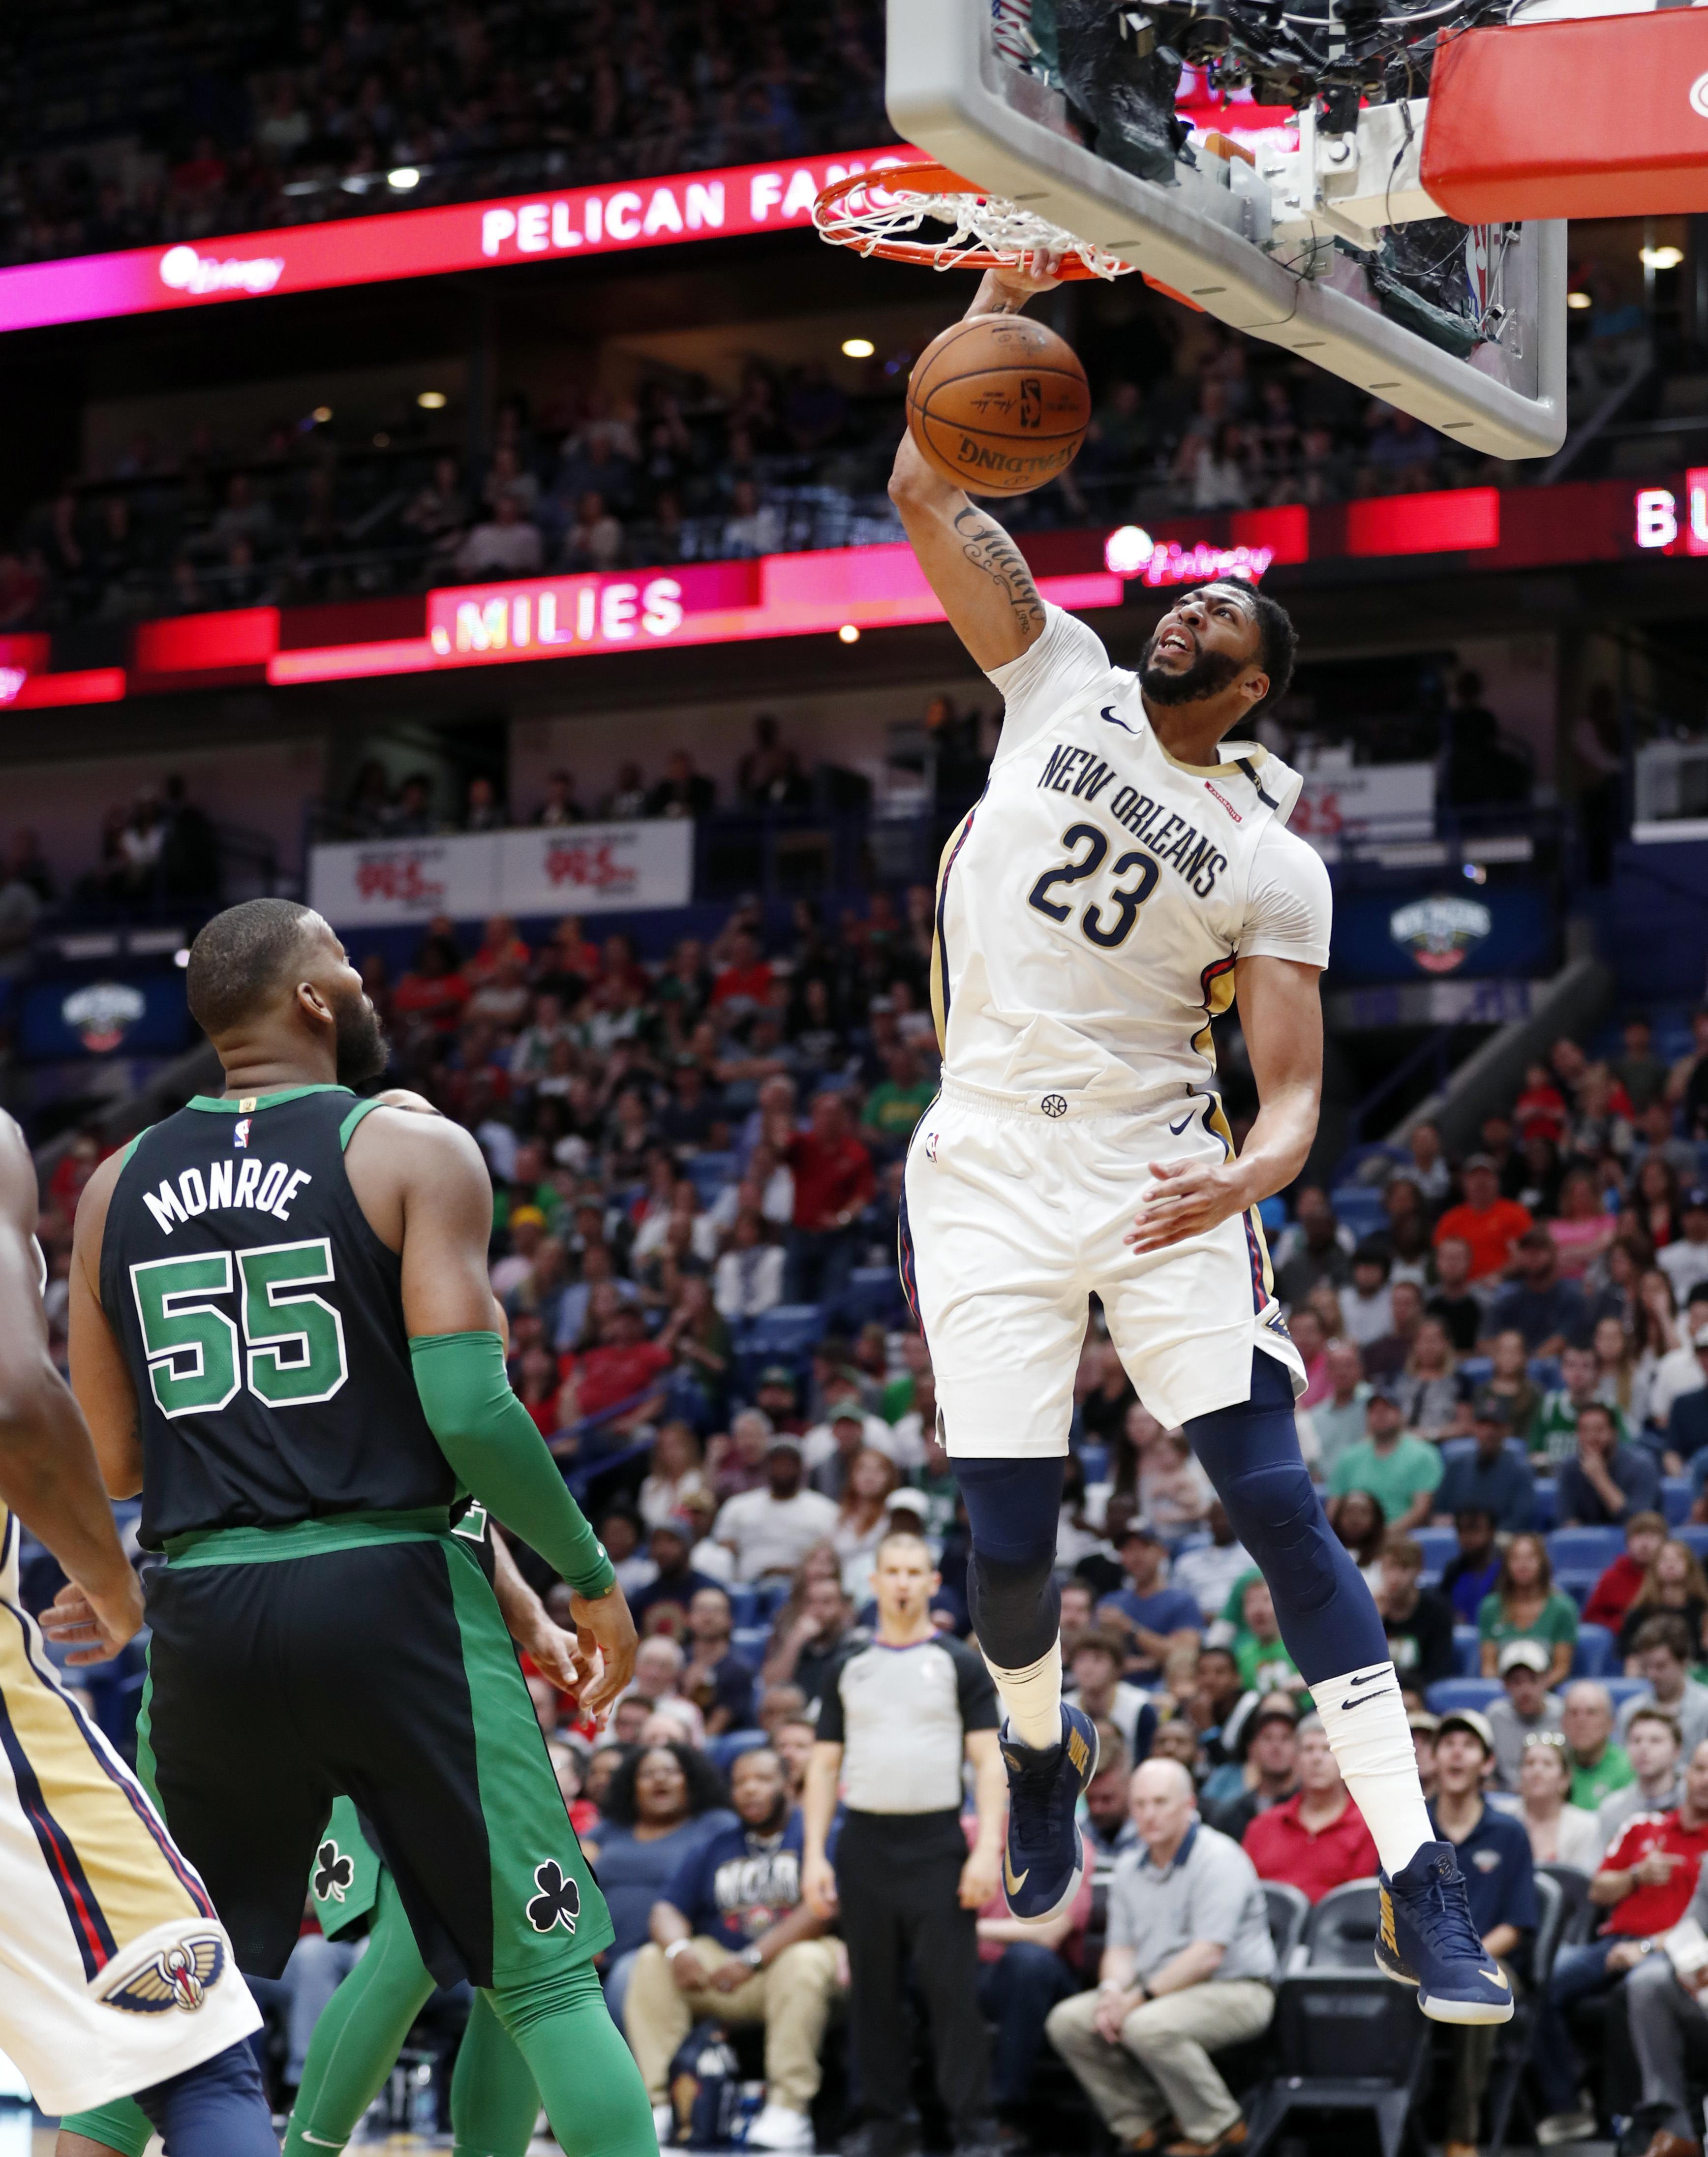 Celtics_pelicans_basketball_86064